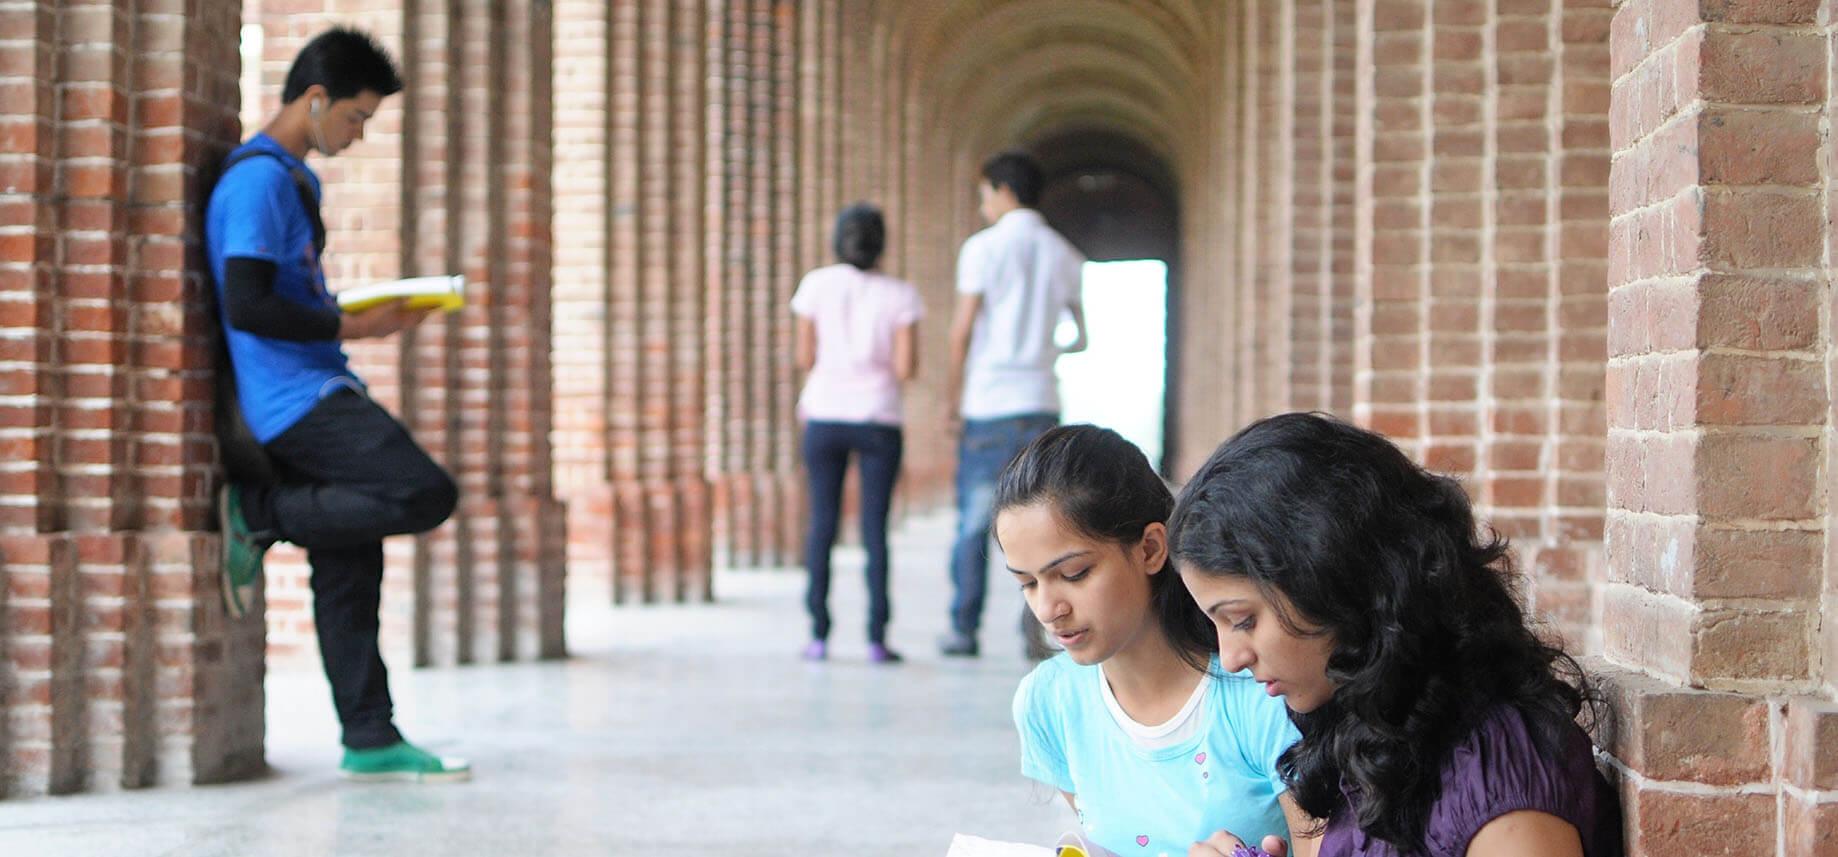 NitroCollege-Website-Title-Blog-Scholarships-11-5-813347-edited